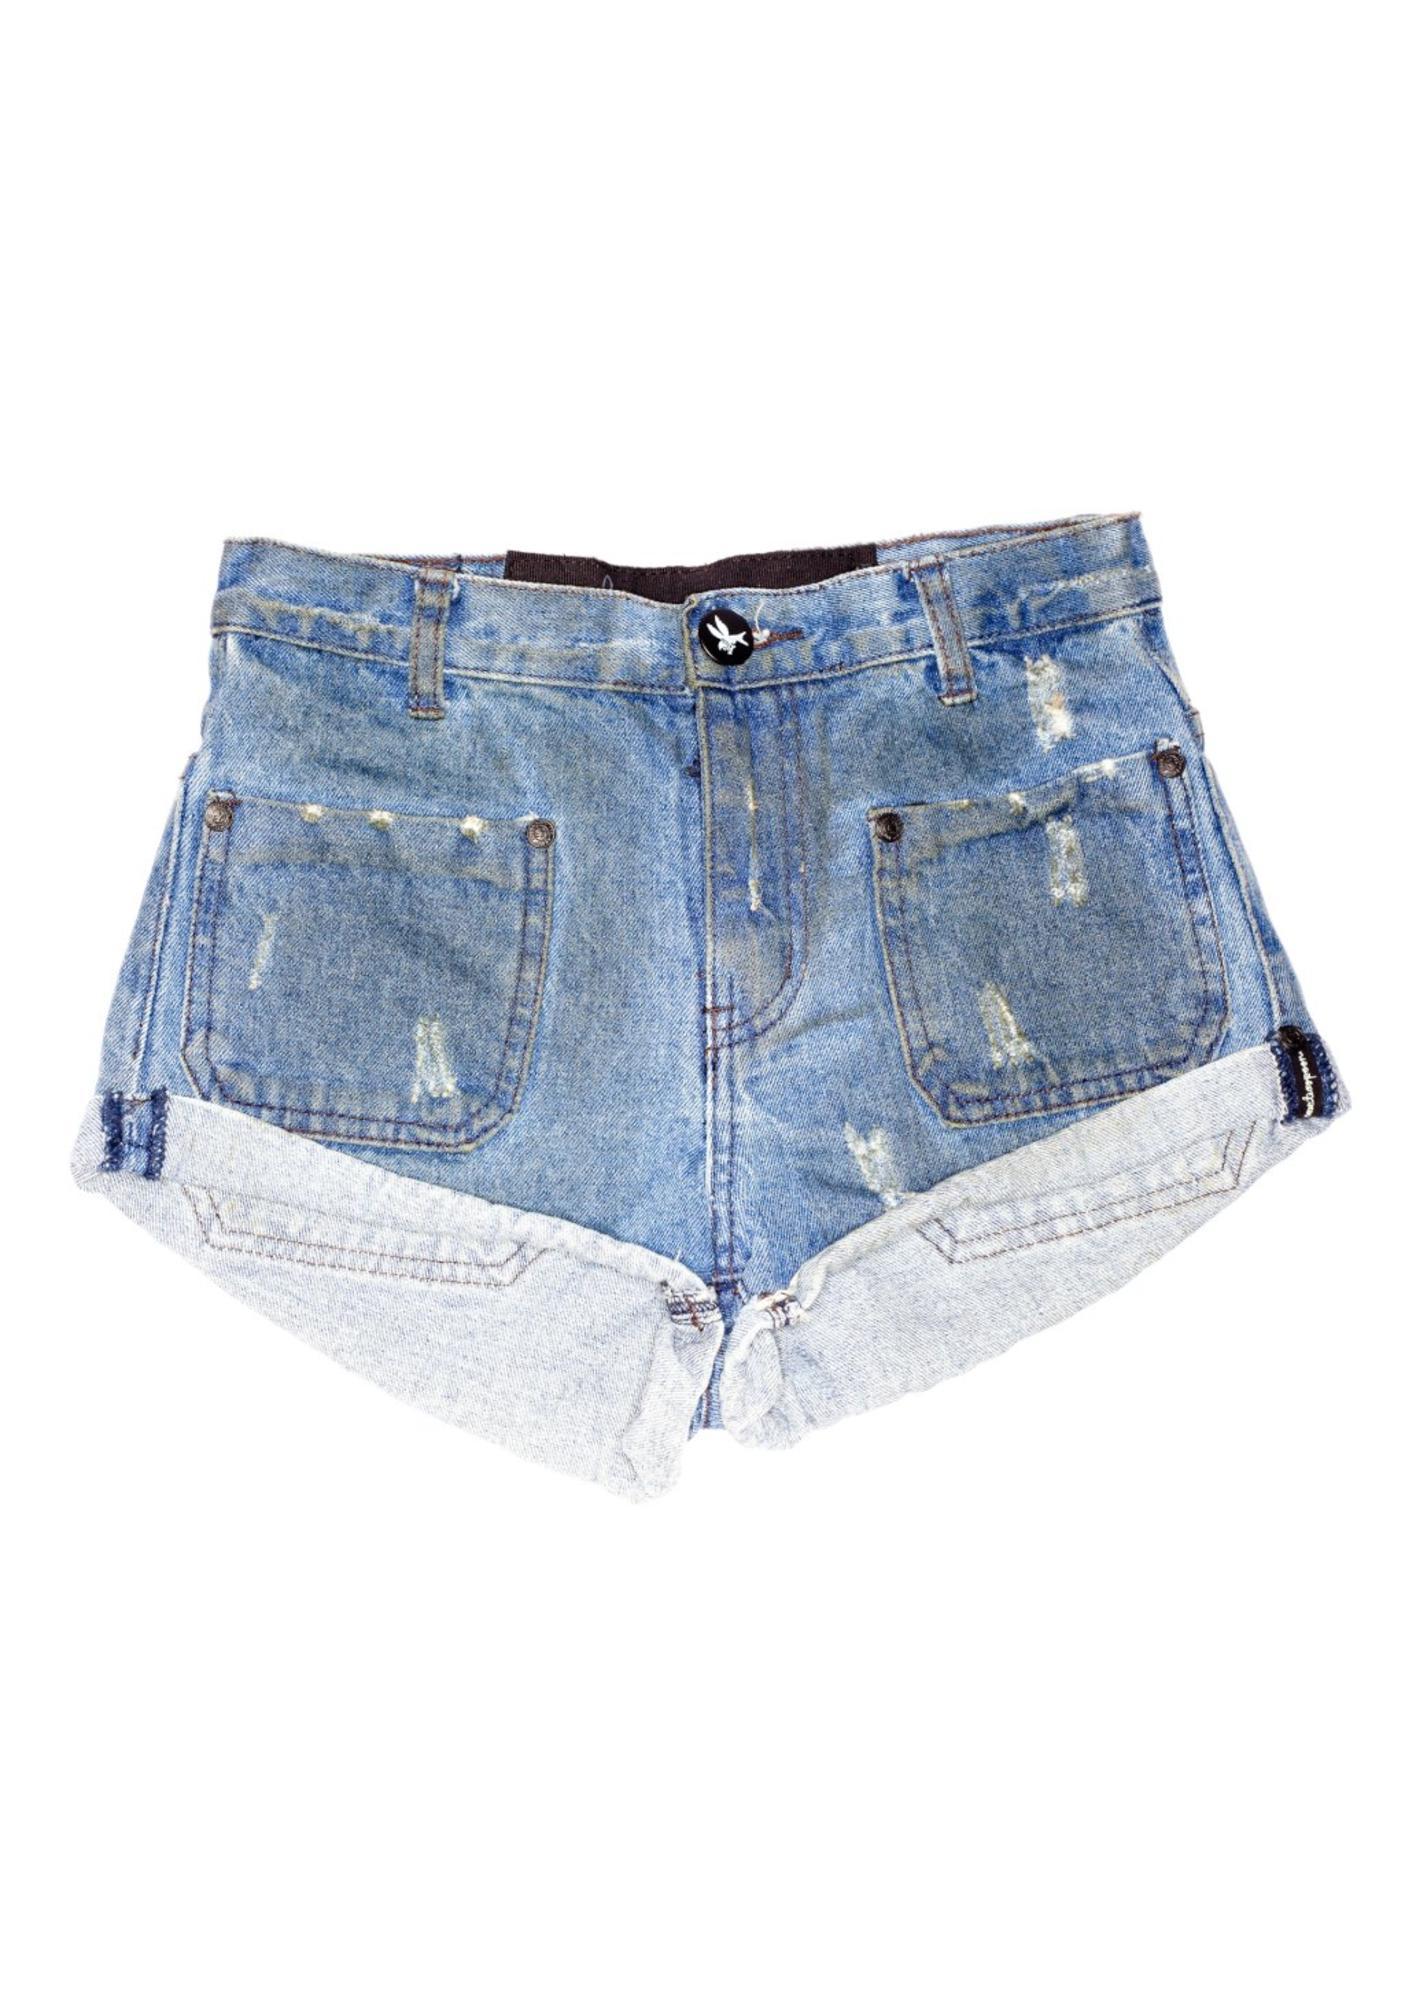 One Teaspoon Sailors Denim Shorts